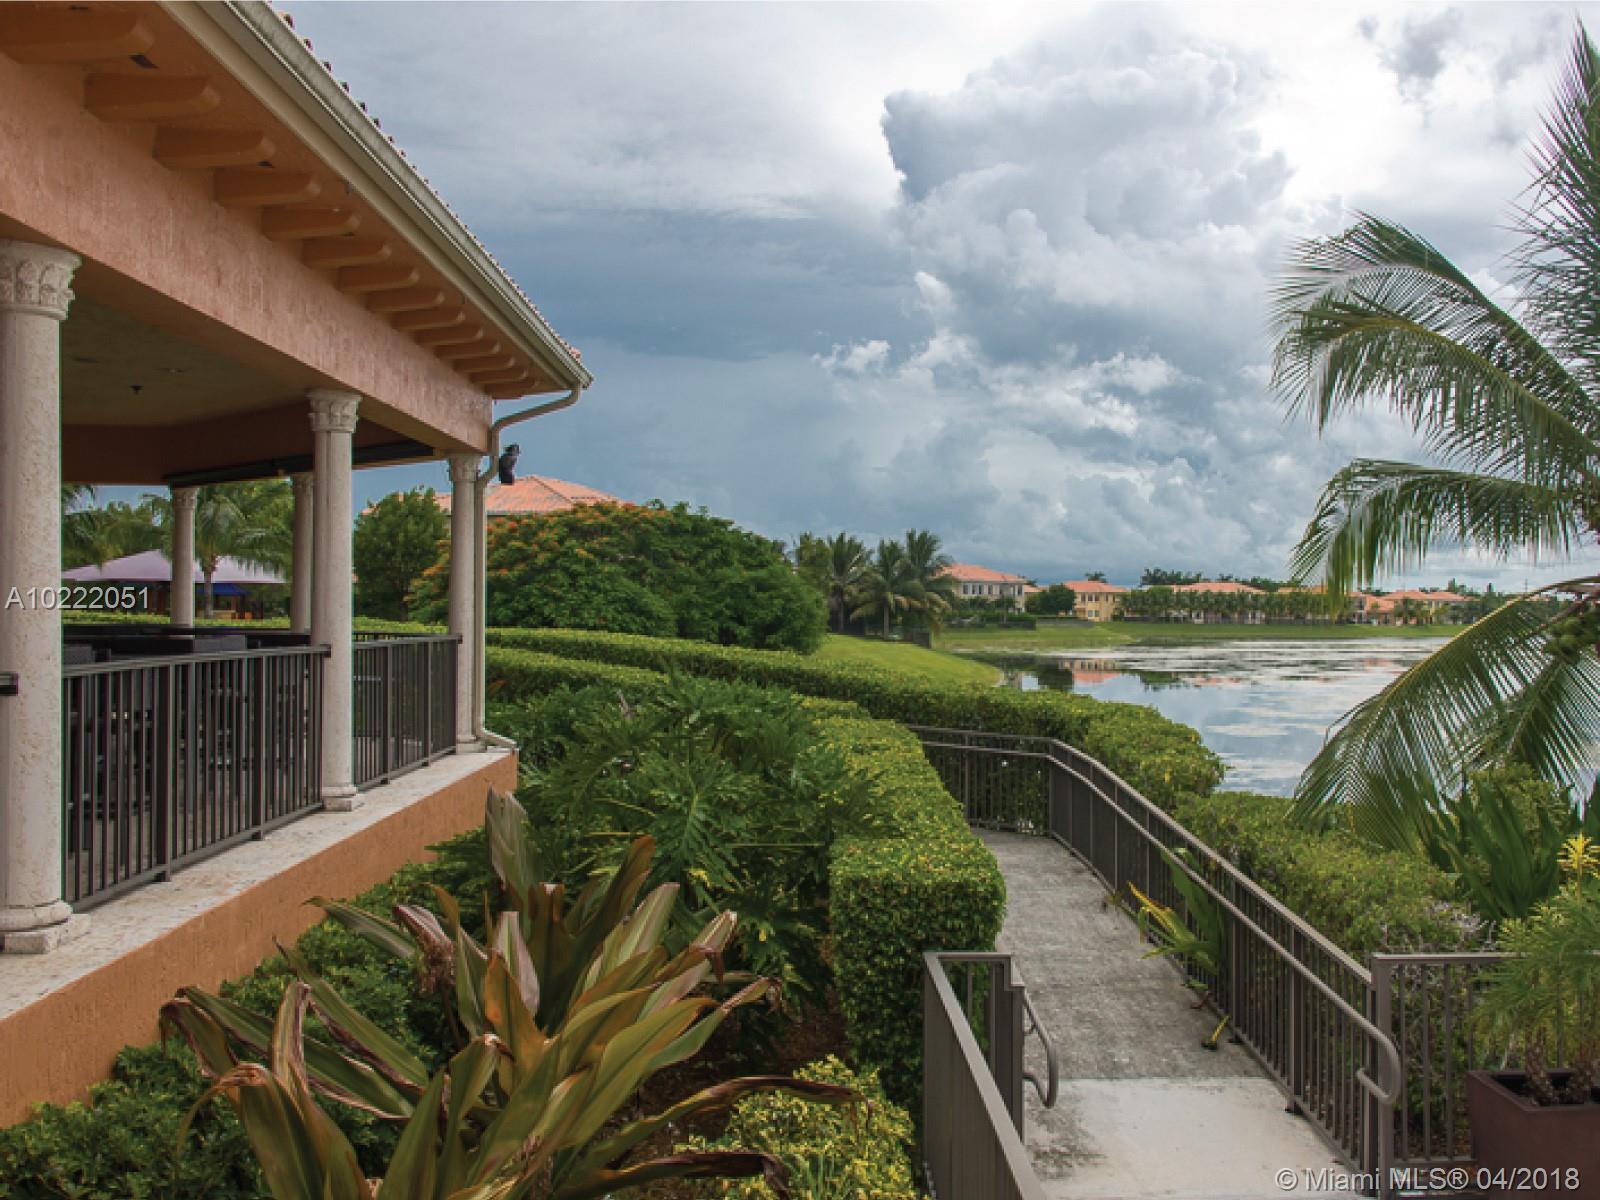 7564 Sw 191st St, Cutler Bay FL, 33157